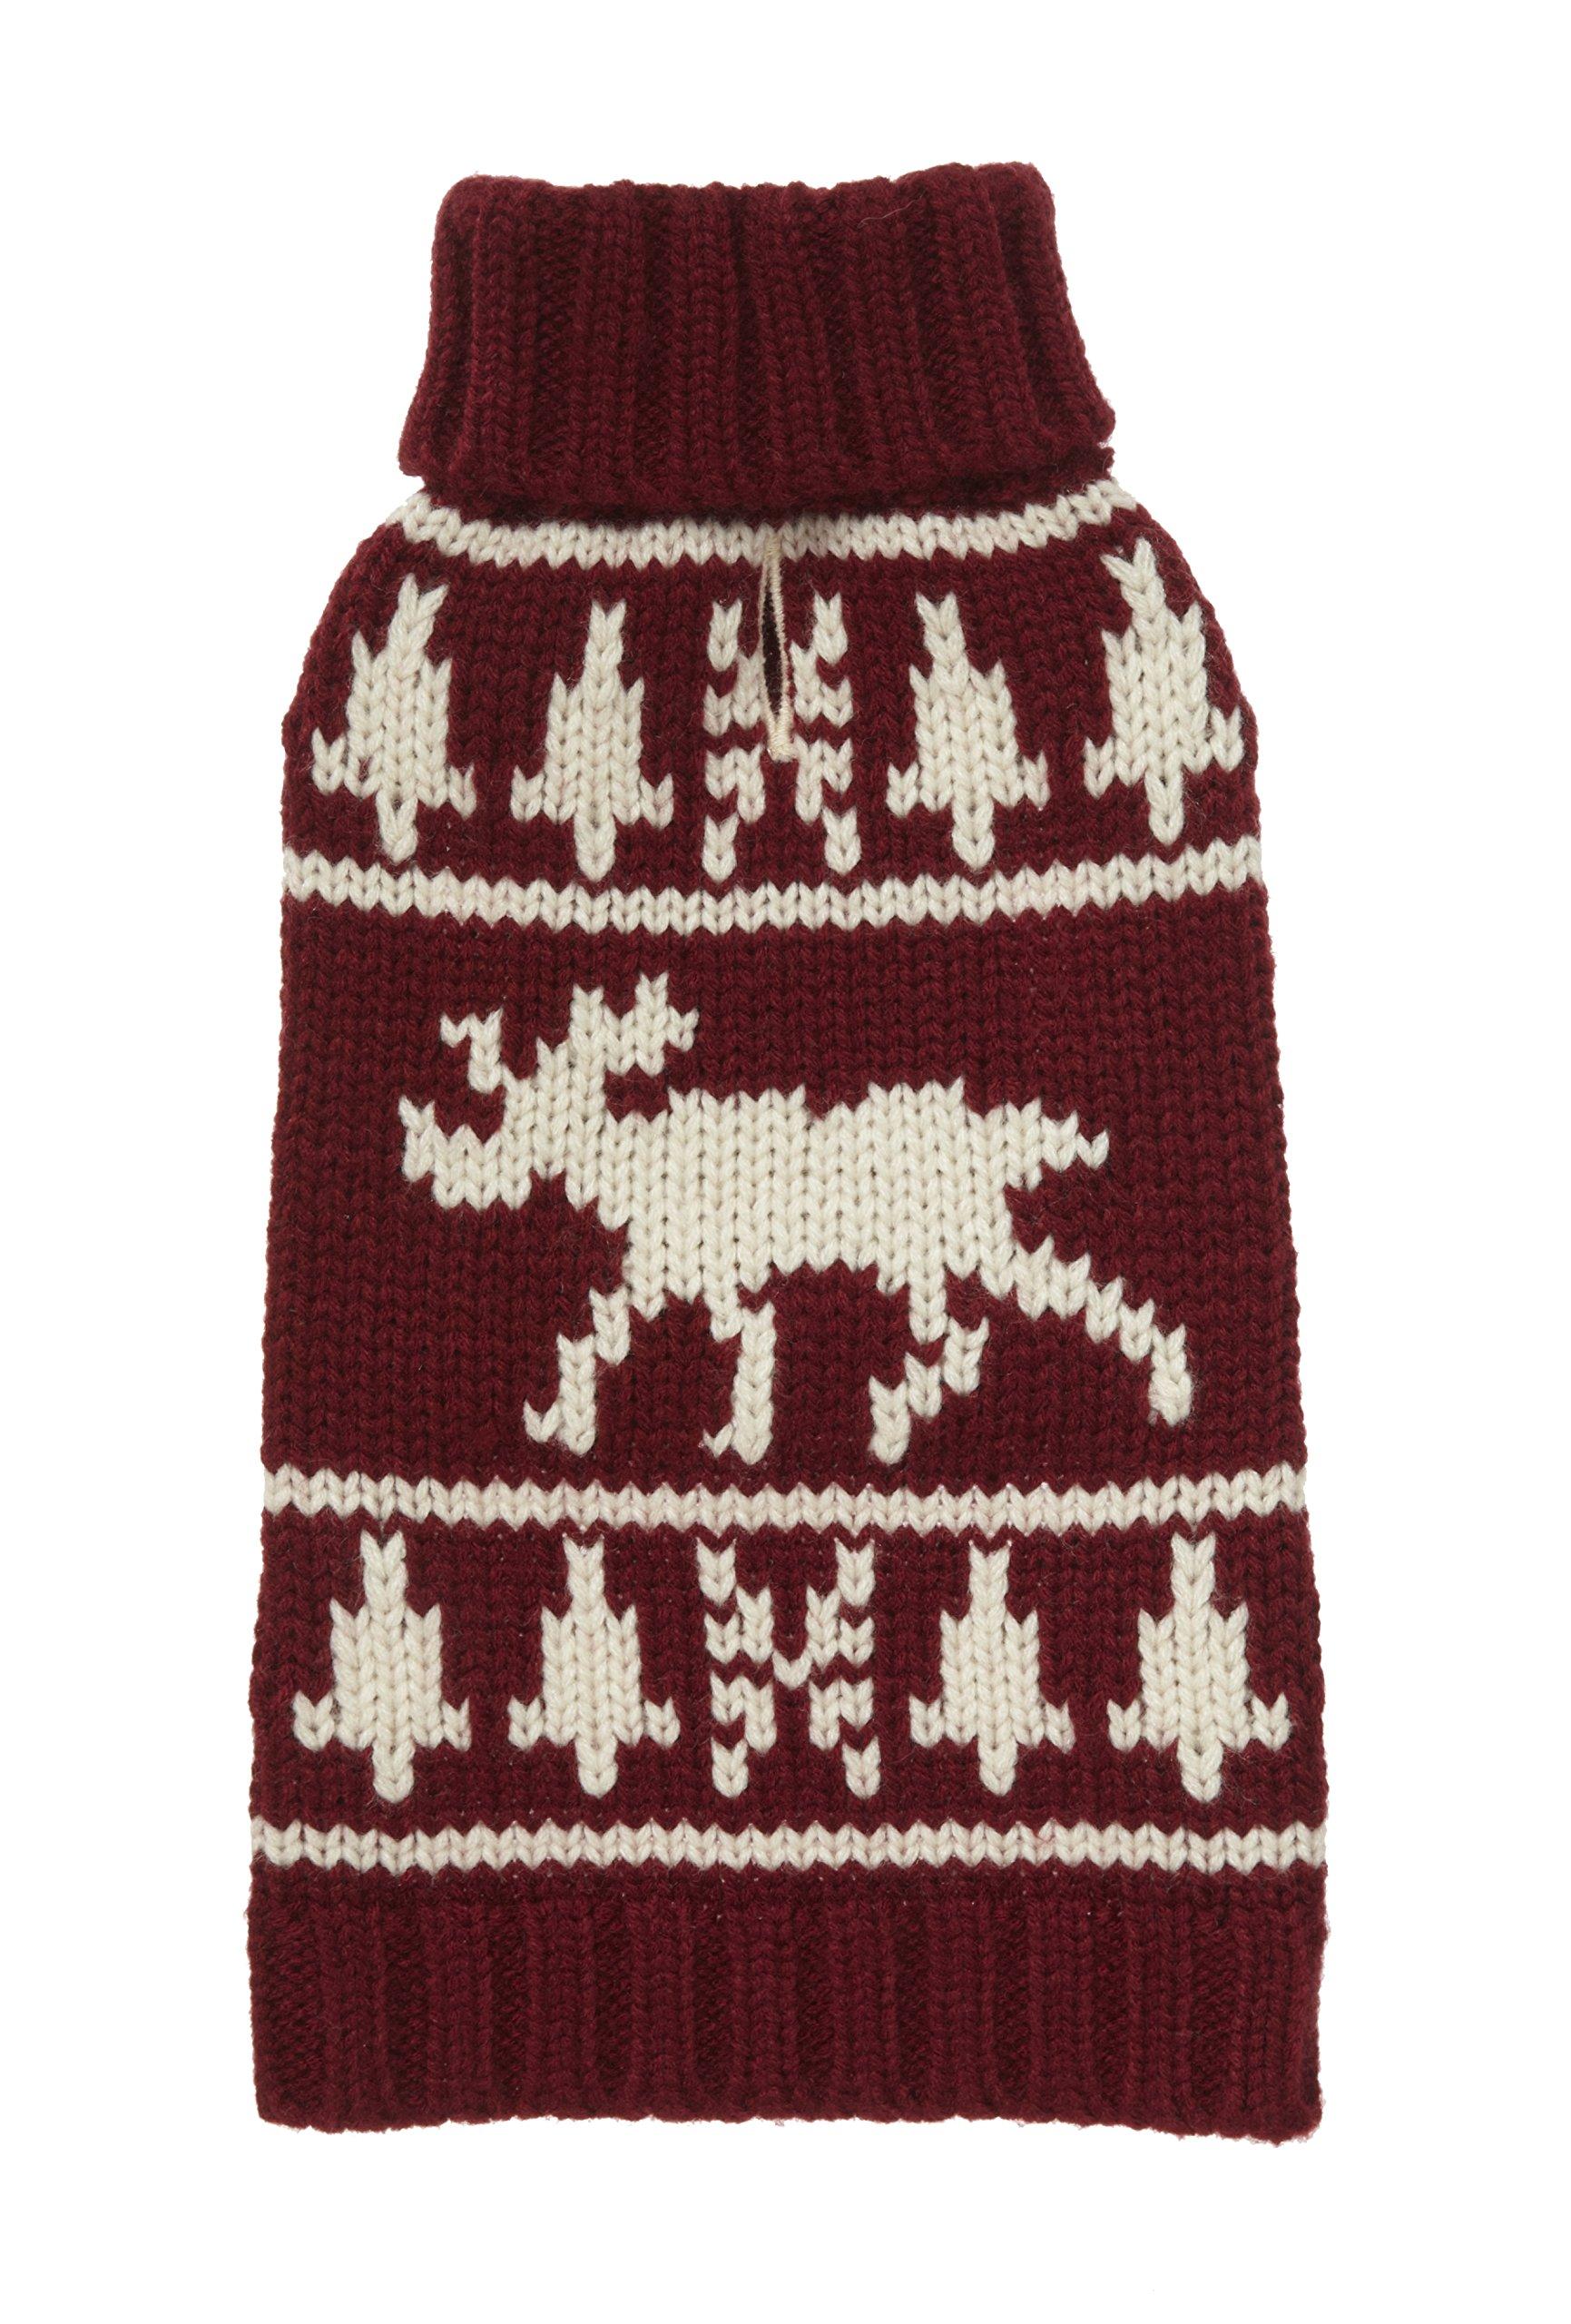 Fab Dog Americana Classics Knit Dog Sweater, Moose Burgundy, 14'' Length by fabdog